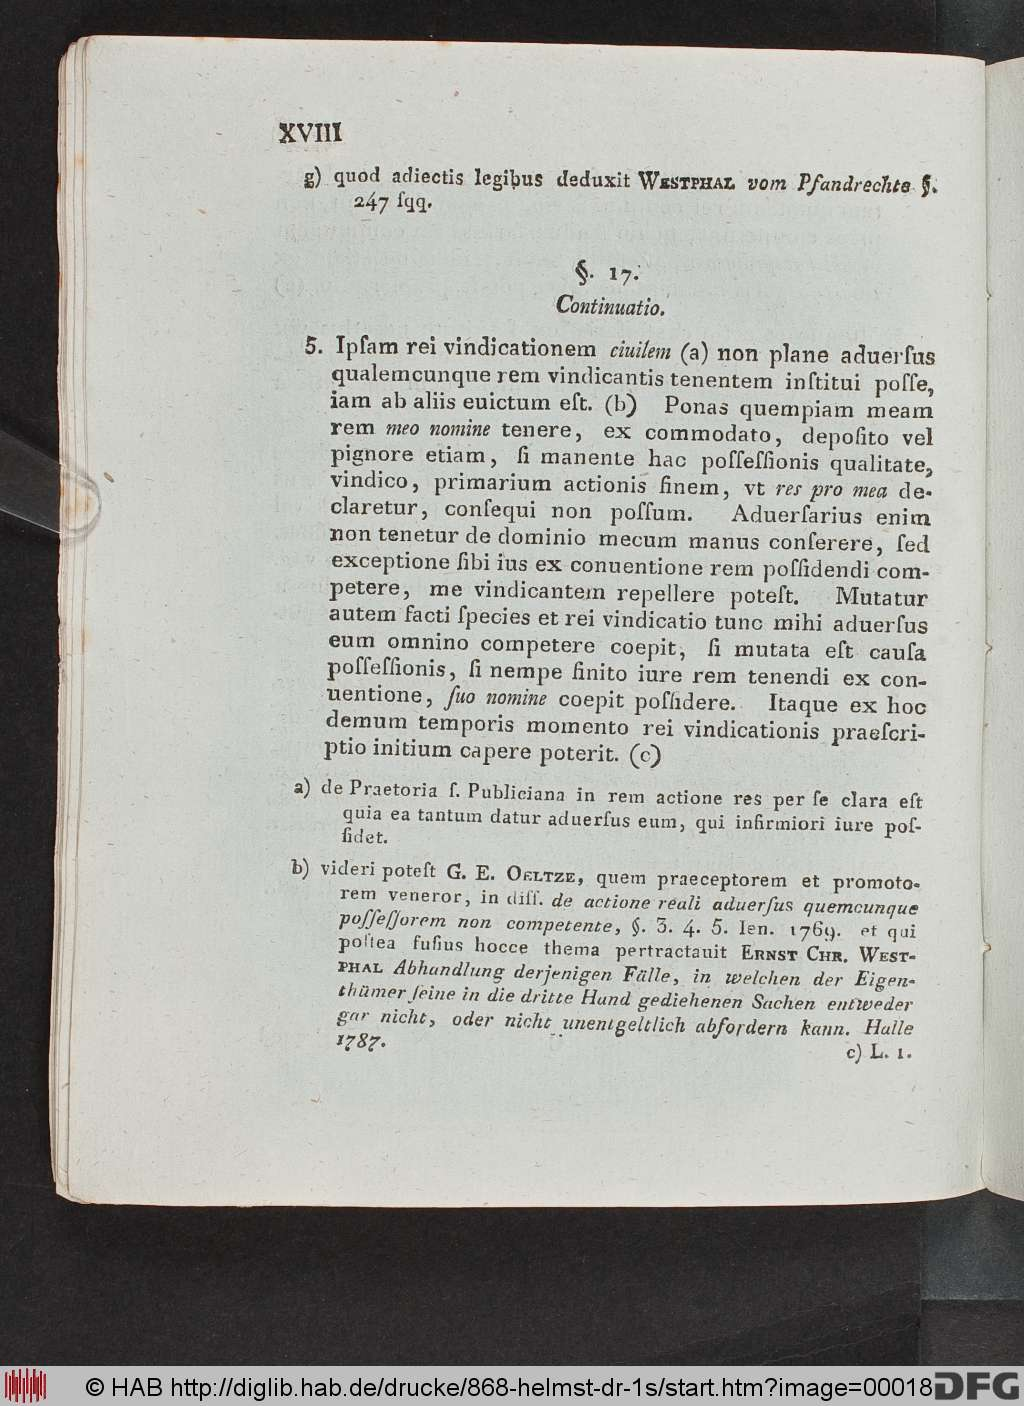 https://diglib.hab.de/drucke/868-helmst-dr-1s/00018.jpg